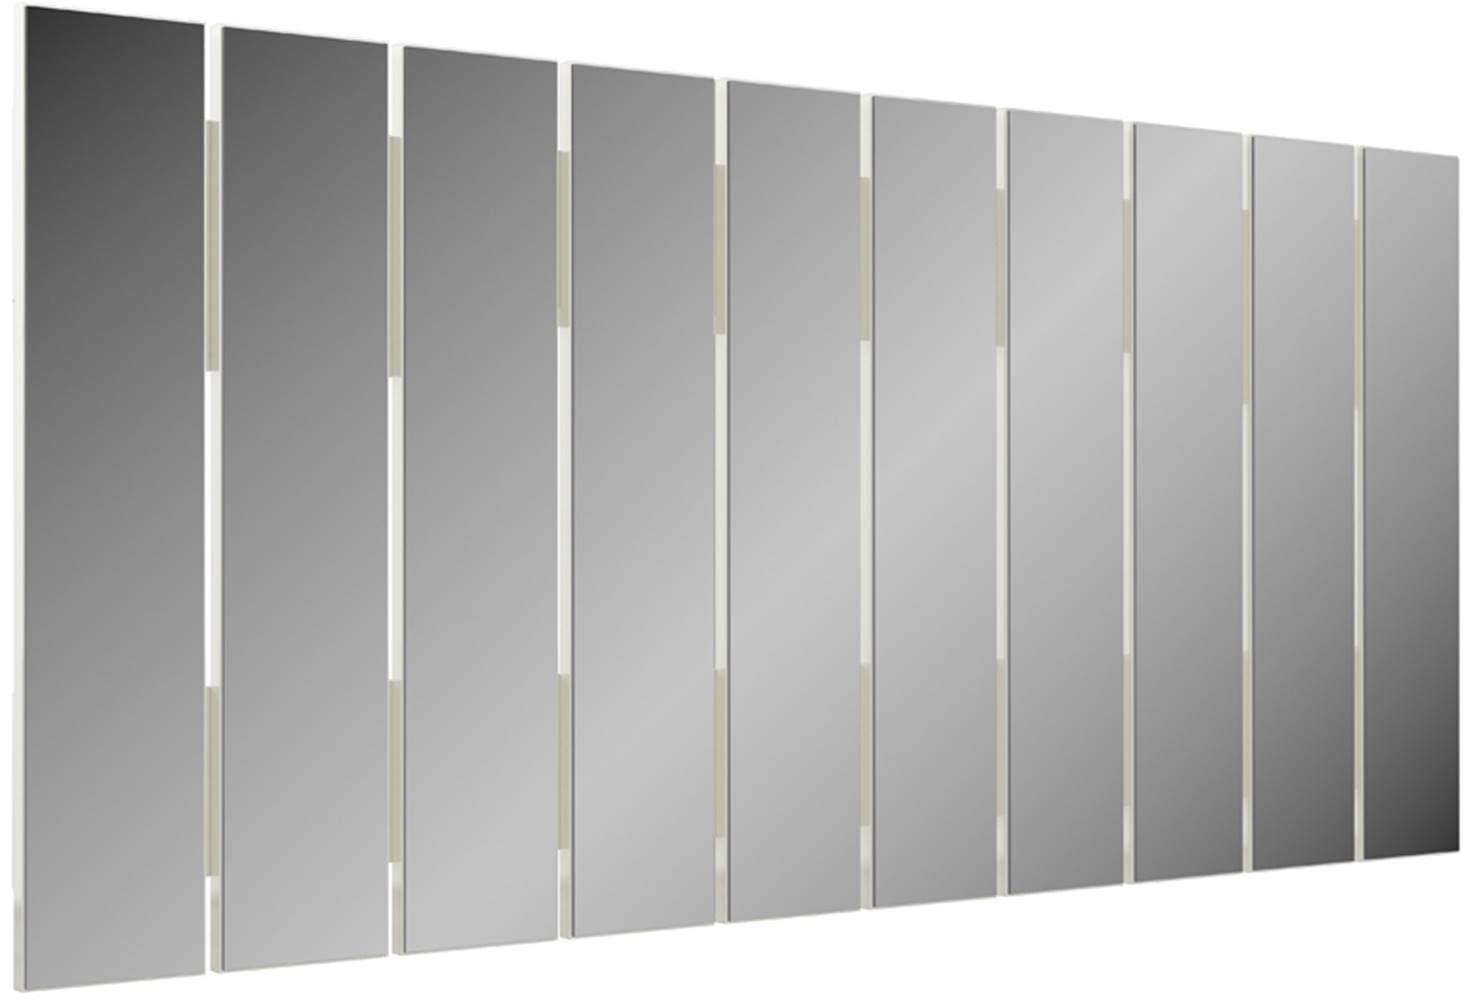 Quadro Espelho Ripas Vertical 1,50 MT (LARG) cor Off White - 47482